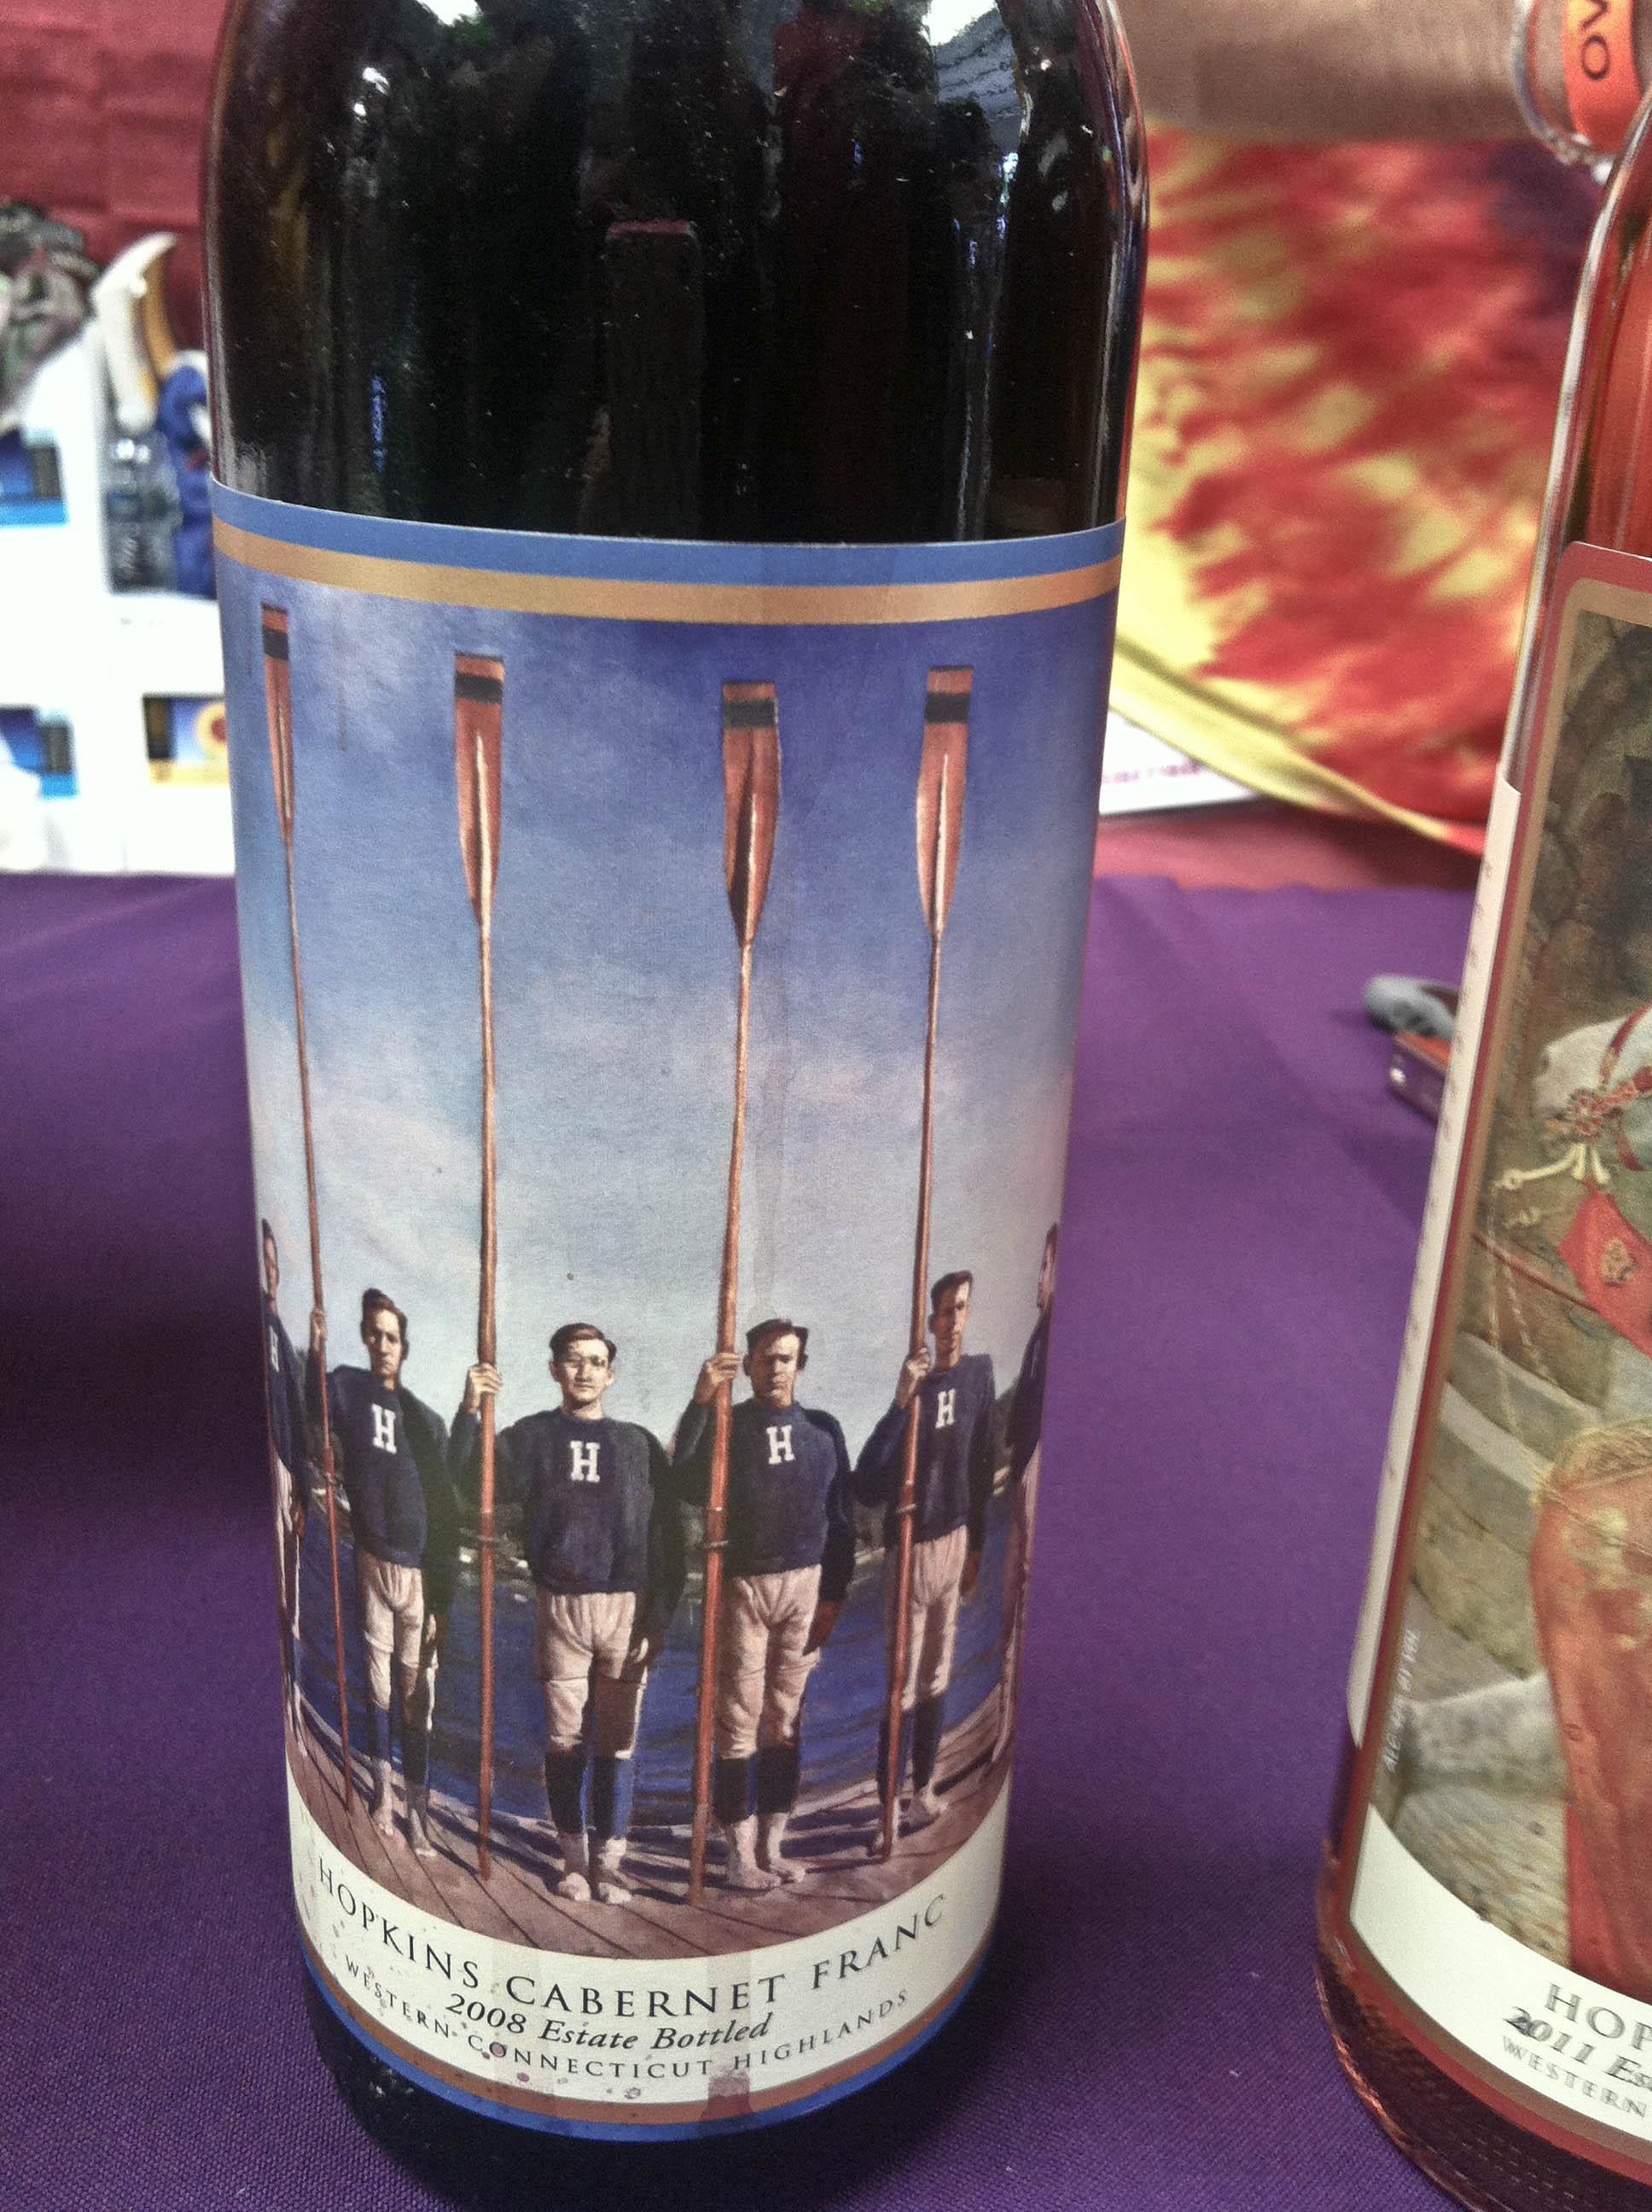 rowers wine label